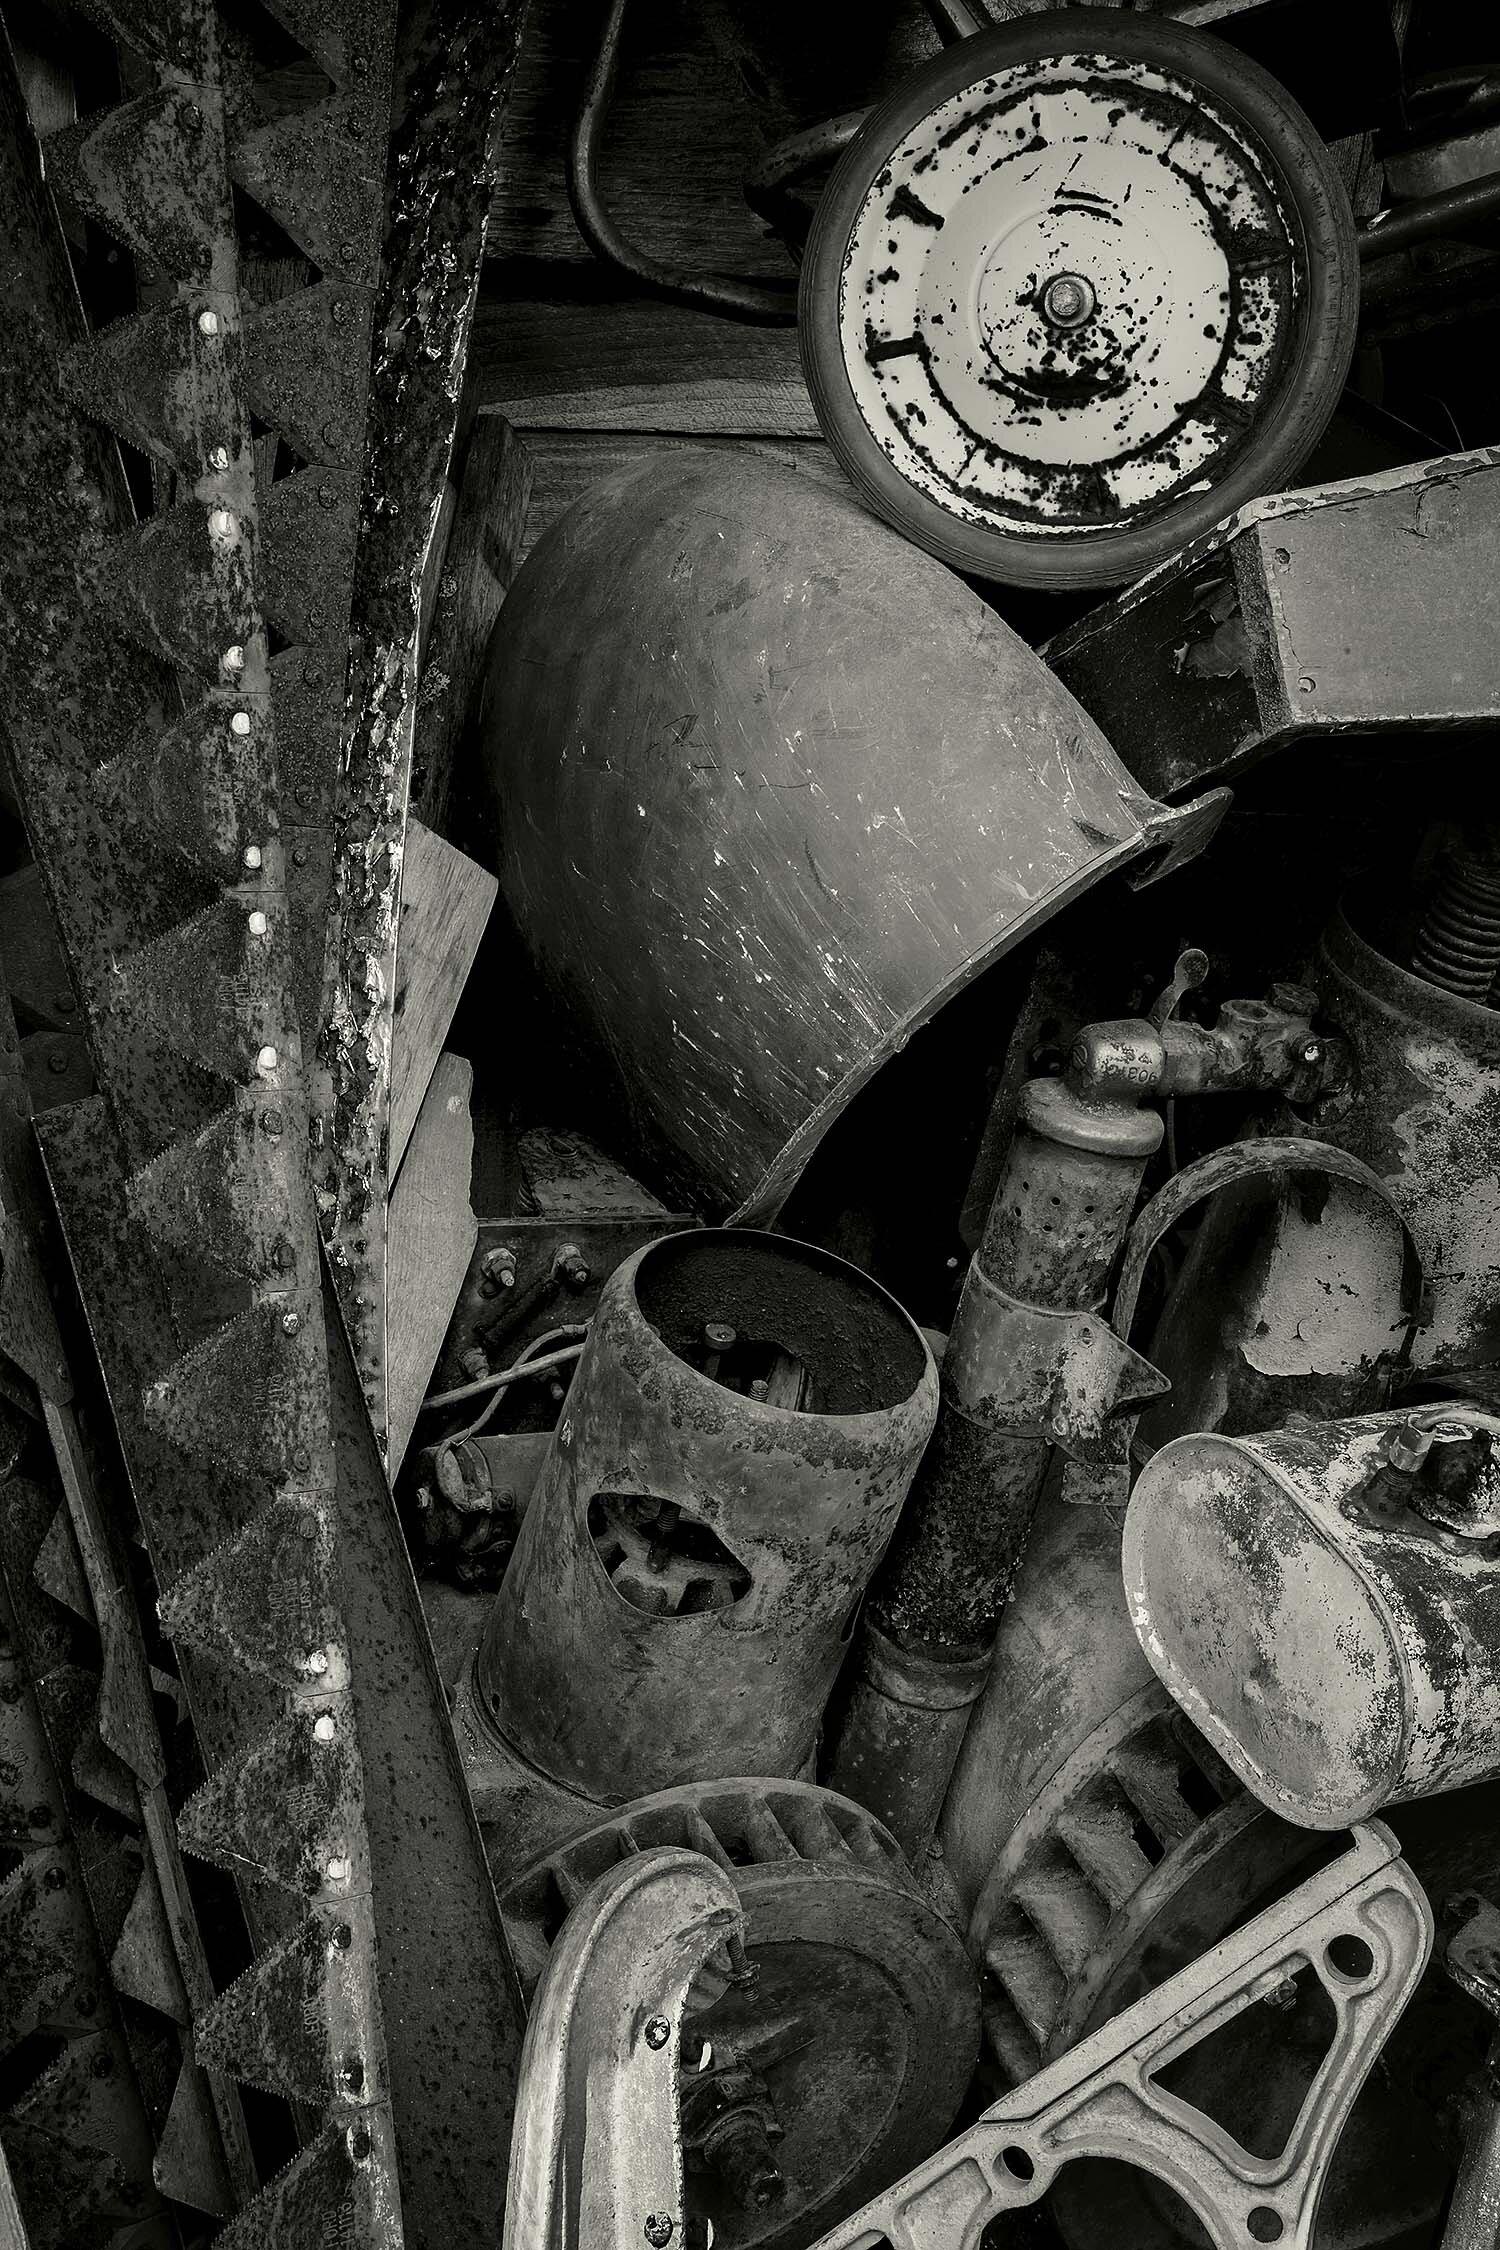 Metal Junk, Searsport, Maine, 2013